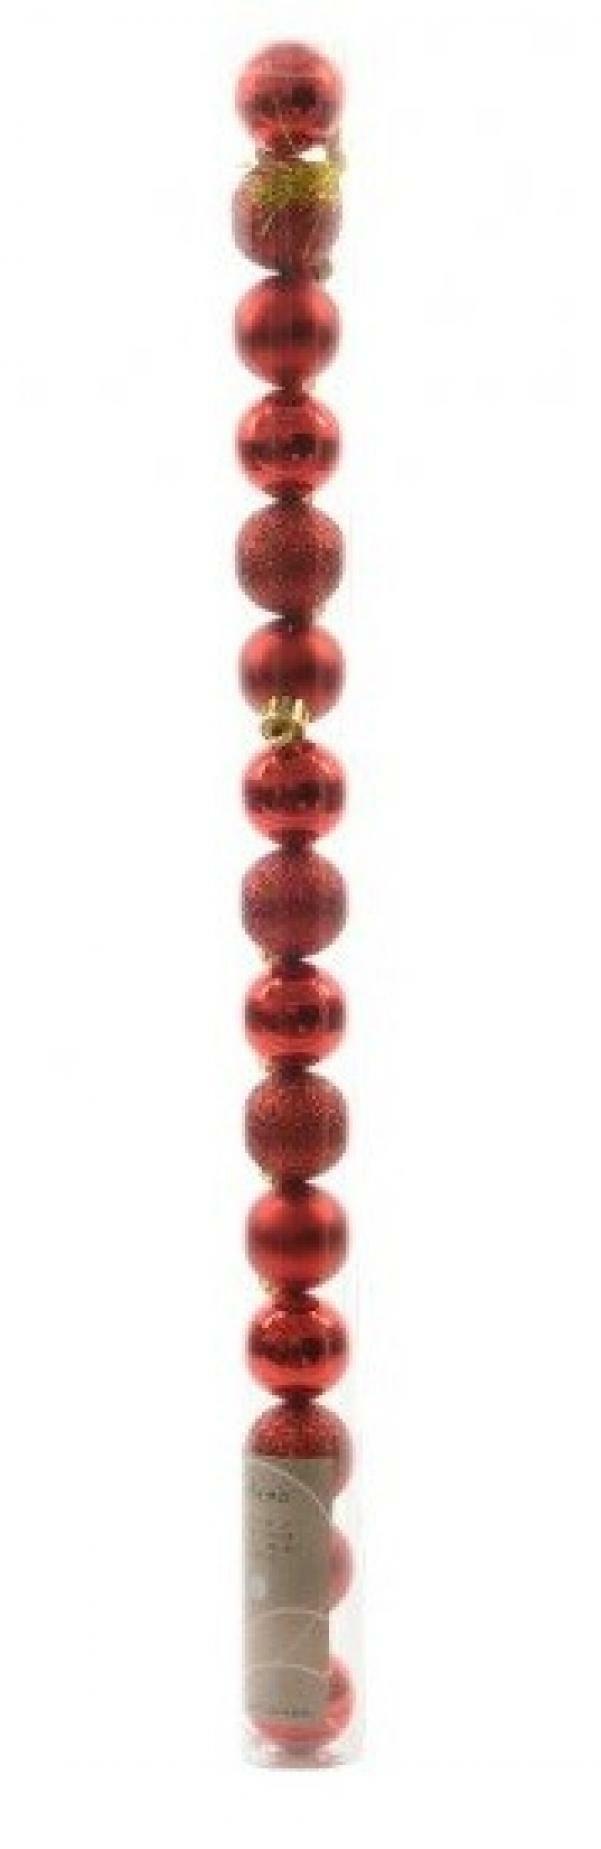 kaemingk kaemingk 15 palle r 3 cm - colore rosso